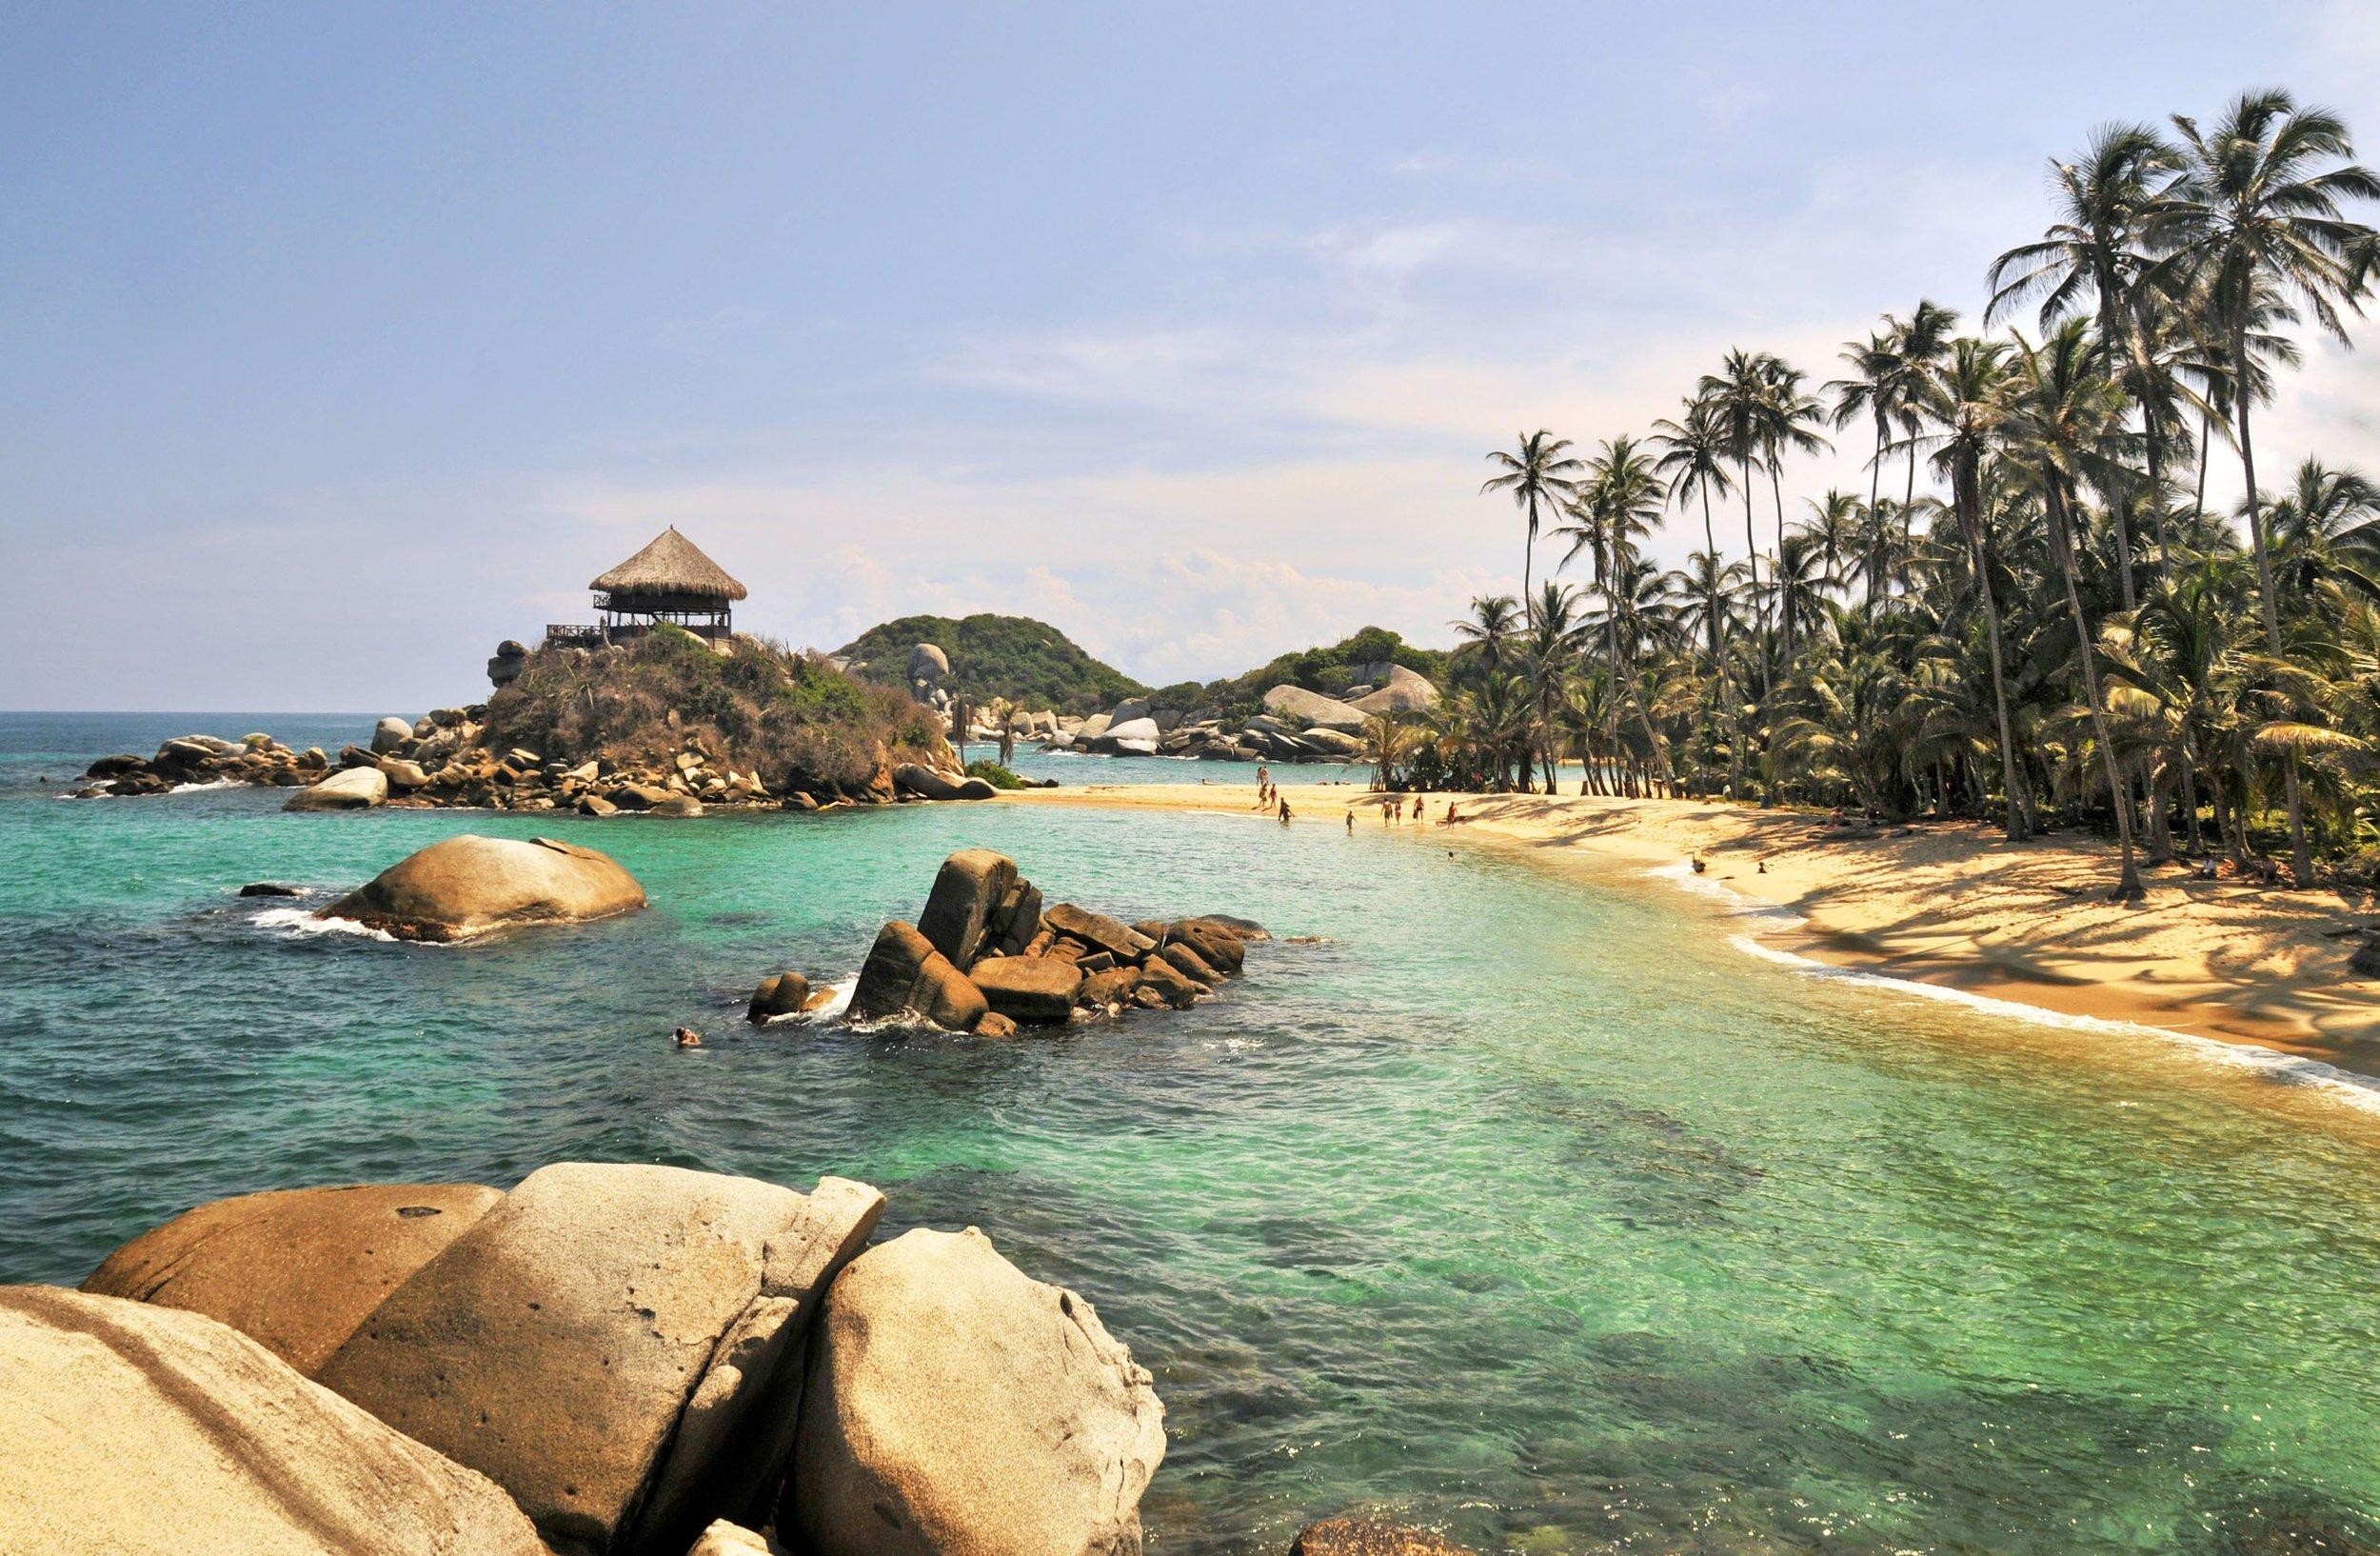 Dental Tourism Colombia Cartagena Beach